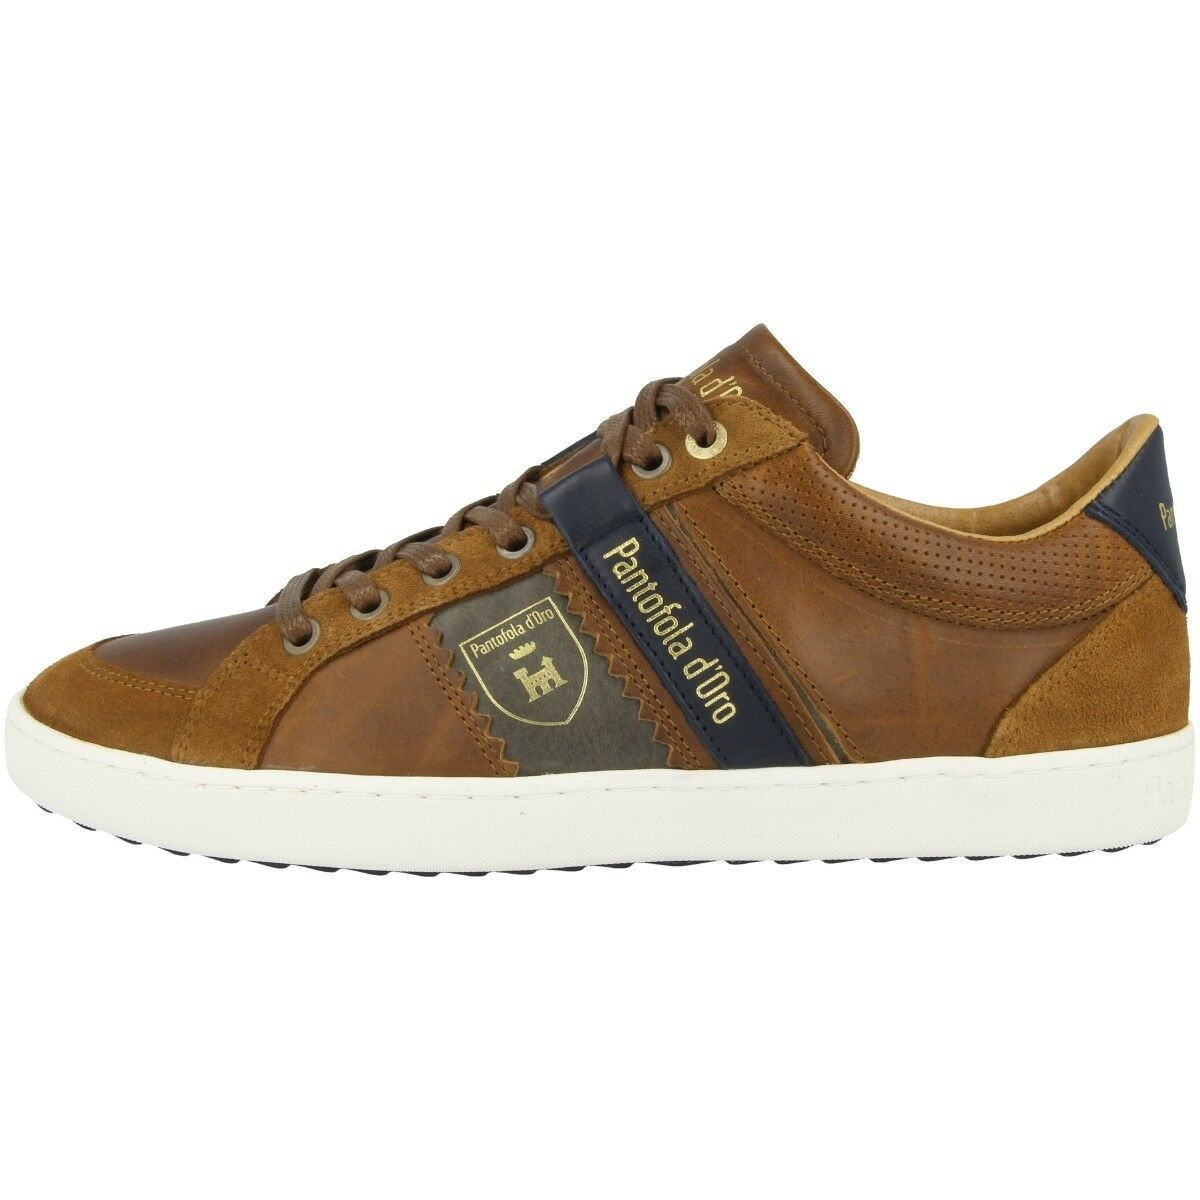 Pantofola d Oro Savio Uomo Low Pesaro Piceno Schuhe Sneaker shell 10183041.JCU